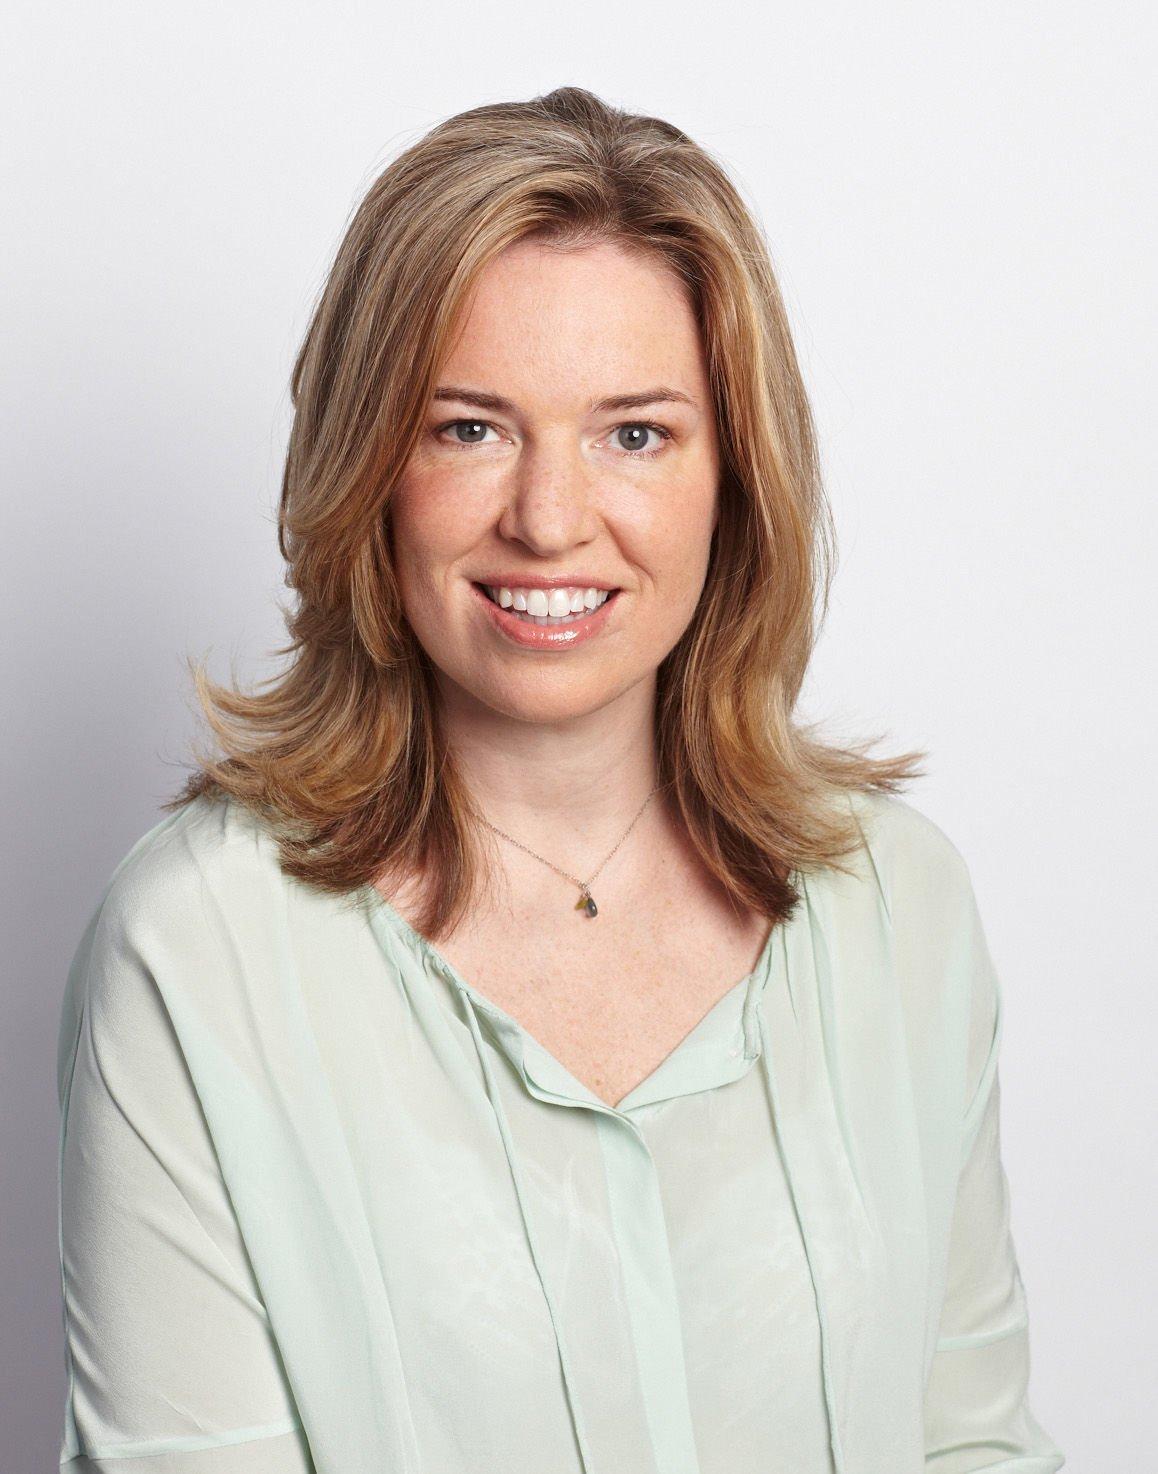 Virginia Heffernan